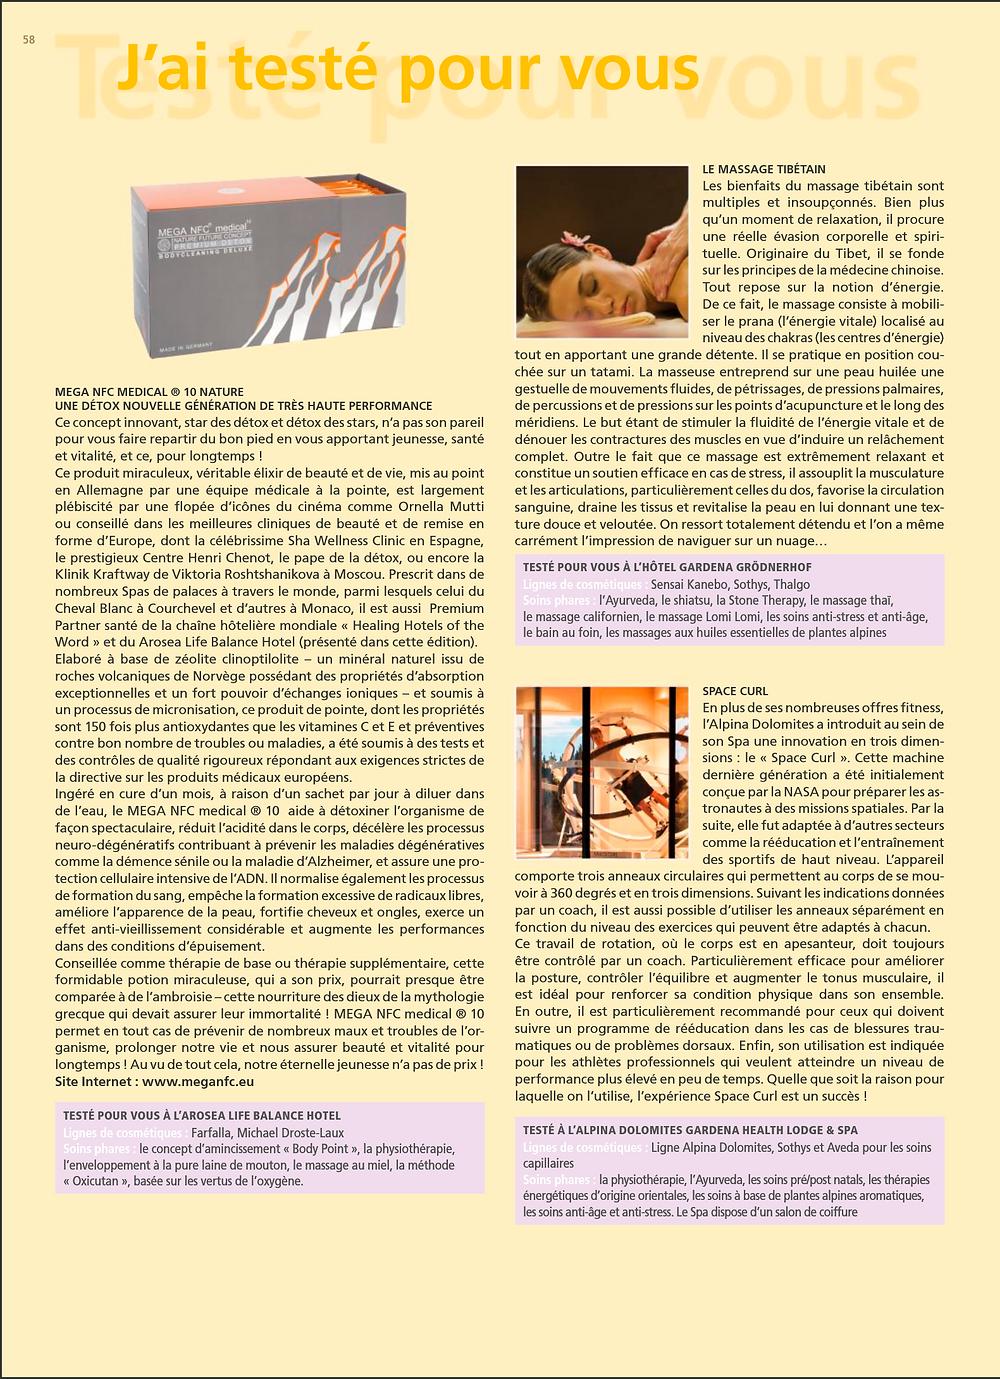 Mega NFC medical 10   Nanoble Health Concept   Detox   Antioxidant